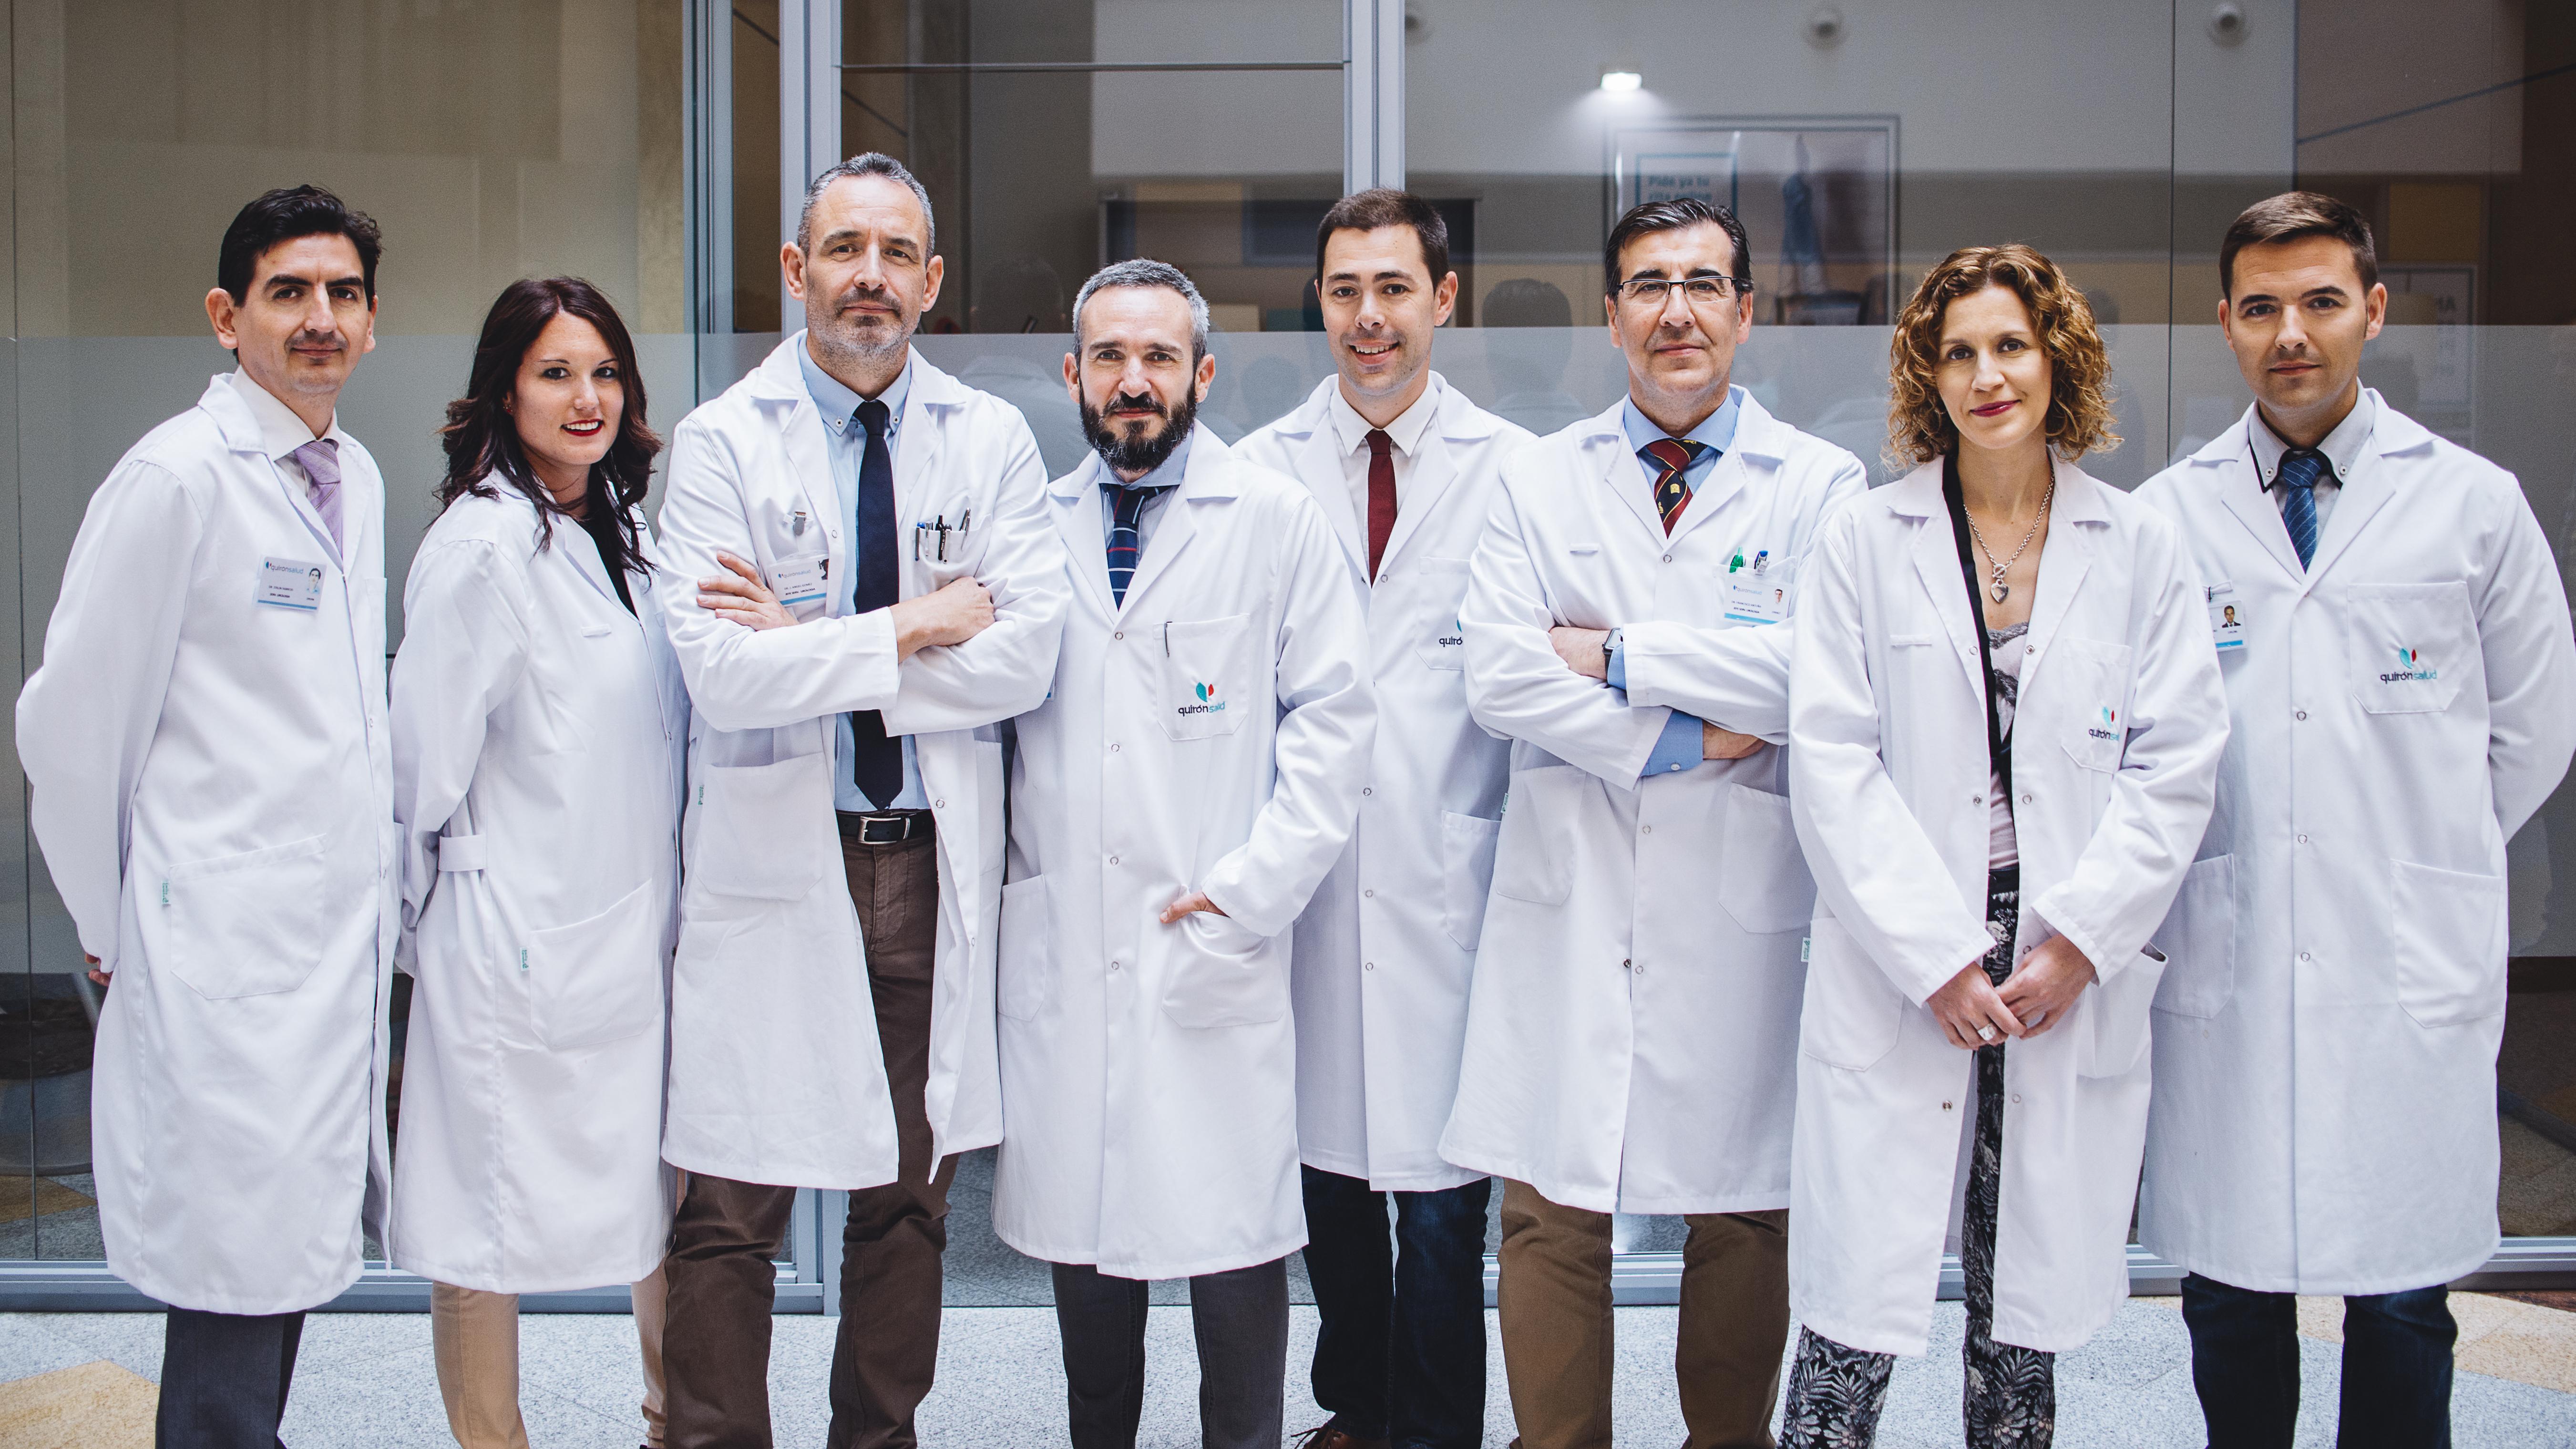 Equipo de urólogos del Hospital Quirón Málaga